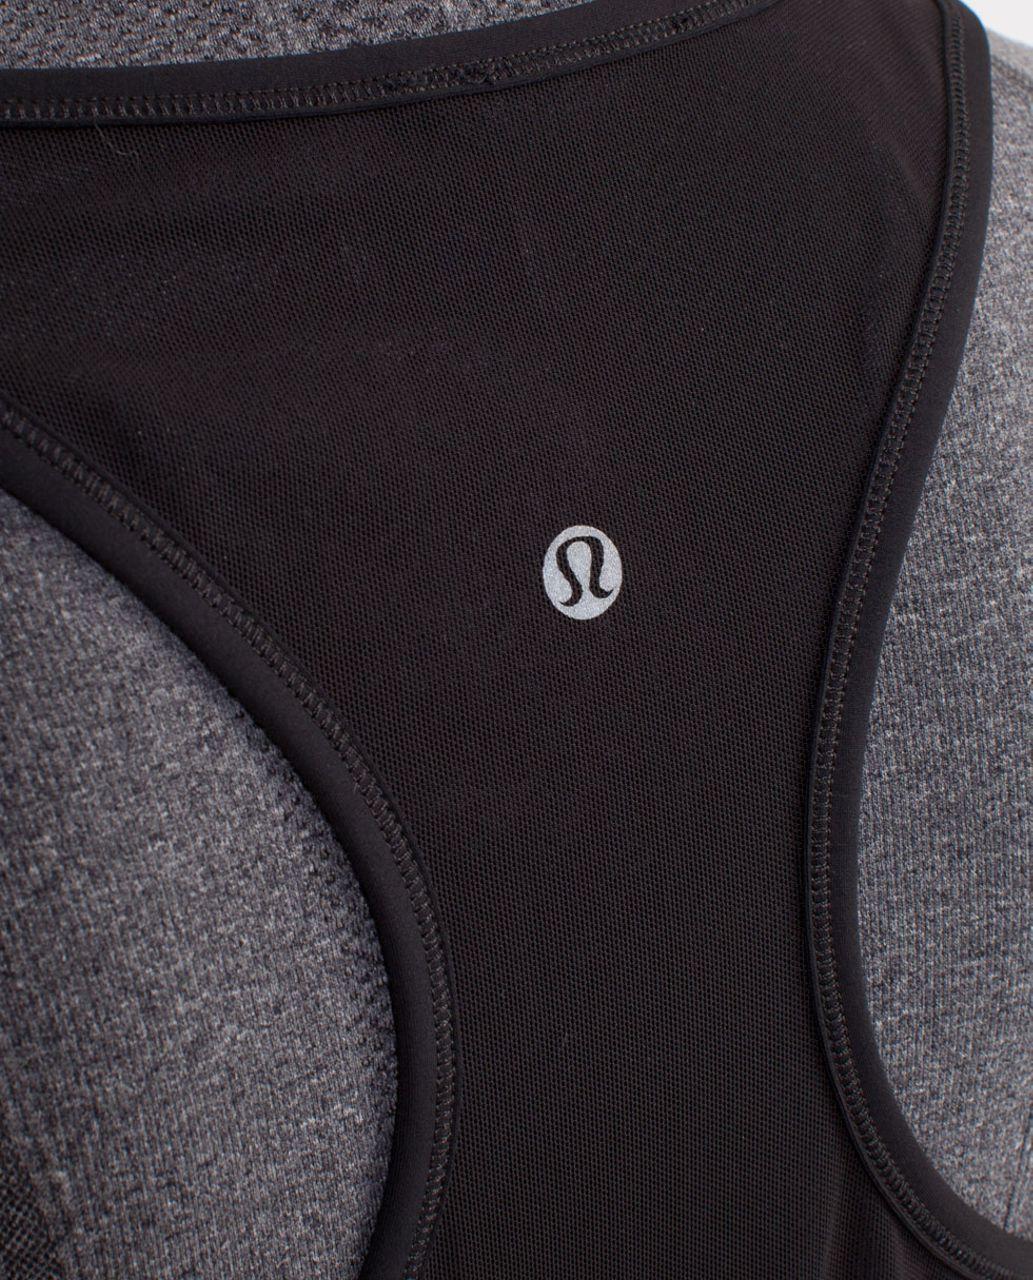 Lululemon Shine Your Heart Out Vest - Black